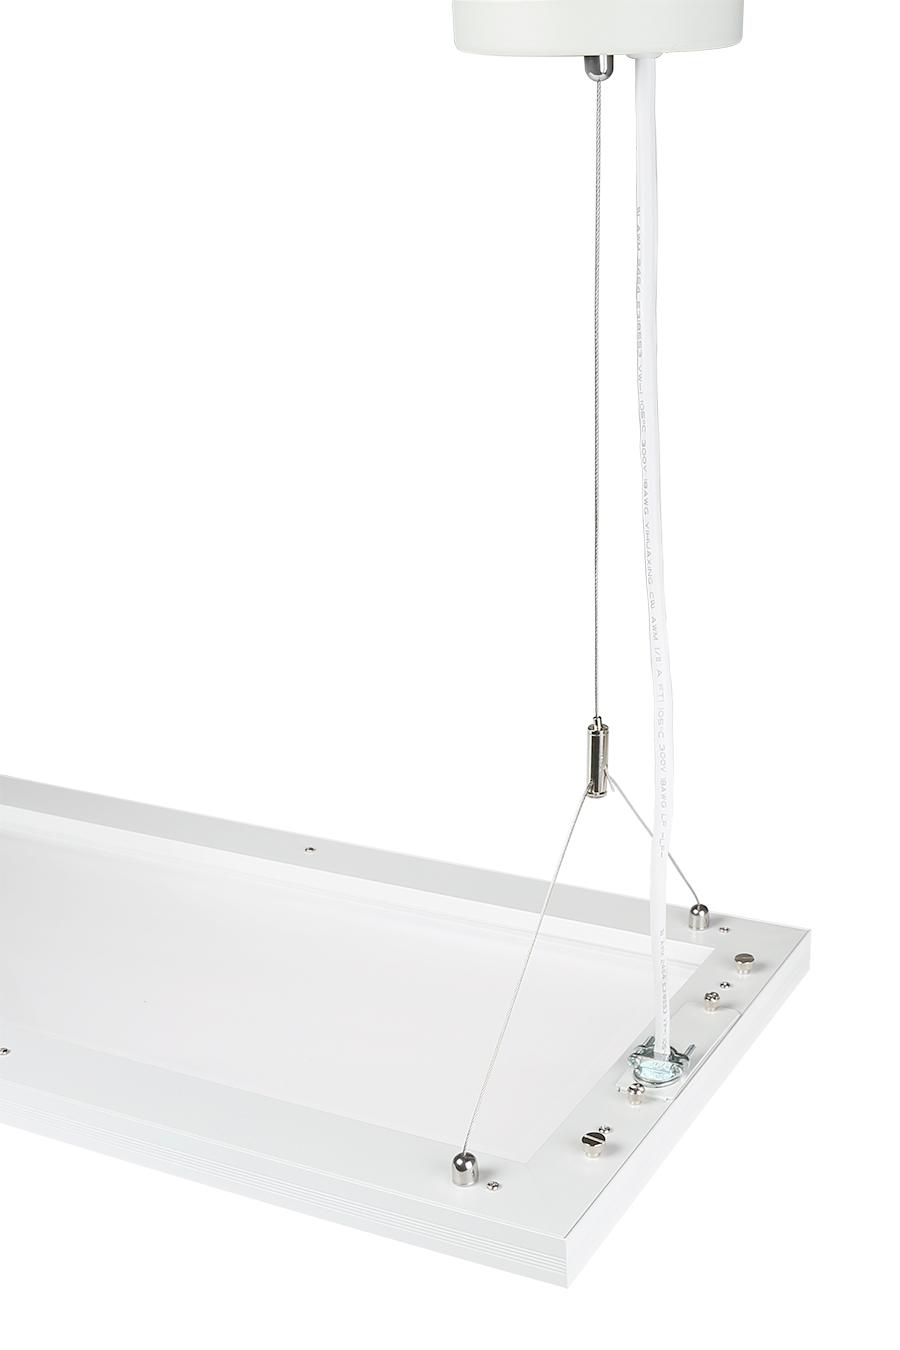 Up/Down LED Panel Light Junction Box Hanging Kit  sc 1 st  Super Bright LEDs & Up/Down LED Panel Light Junction Box Hanging Kit | High Voltage ... Aboutintivar.Com